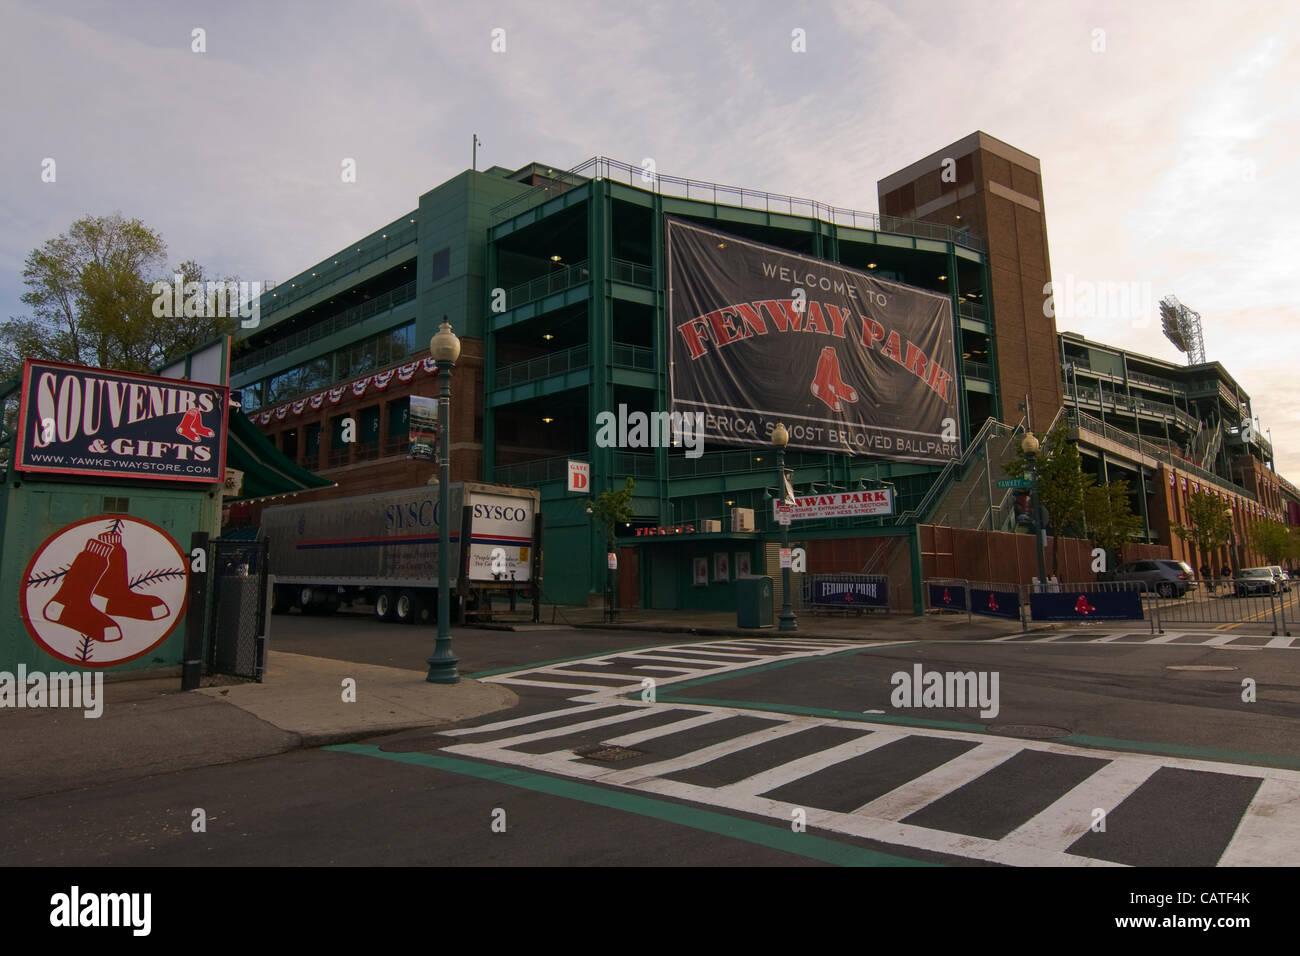 Boston, Massachusetts, USA  April 19, 2012  A SYSCO truck is